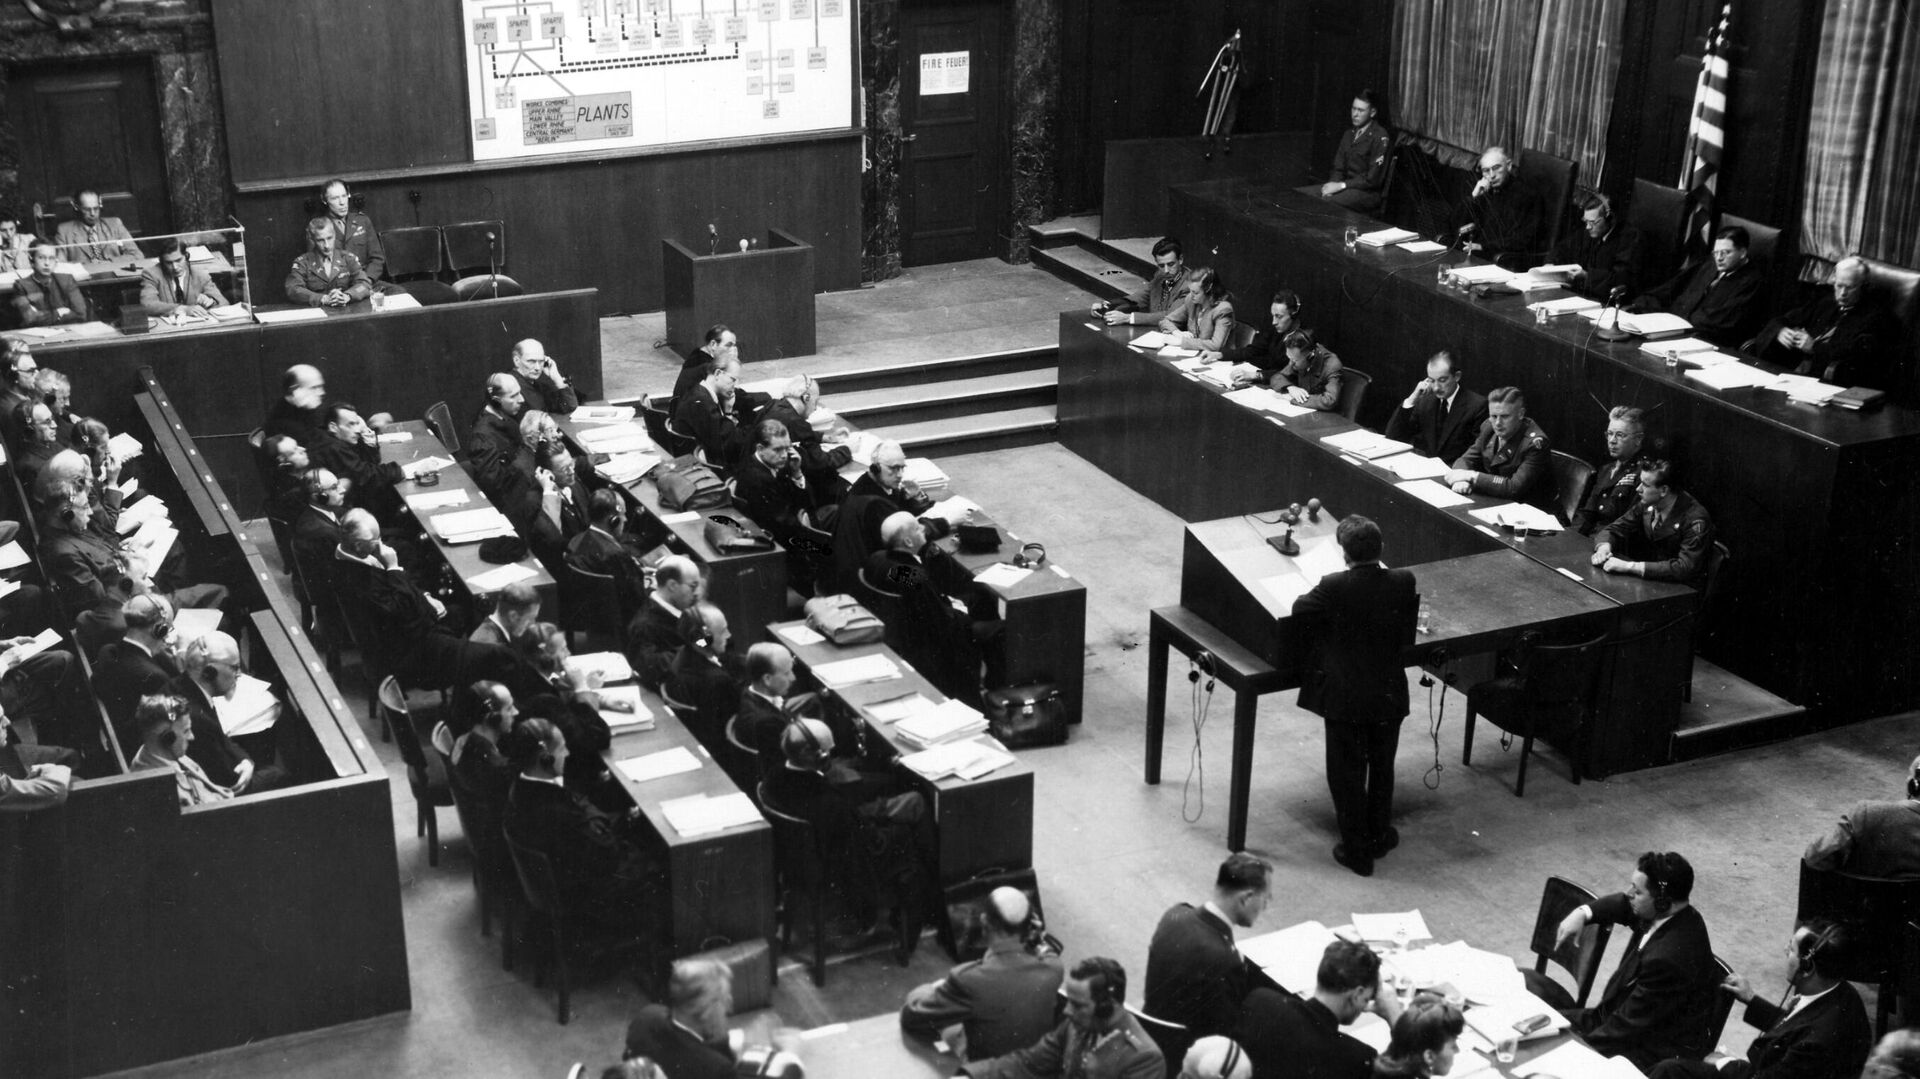 Nürnberger Prozess gegen die Hauptkriegsverbrecher, 1948 - SNA, 1920, 07.12.2020